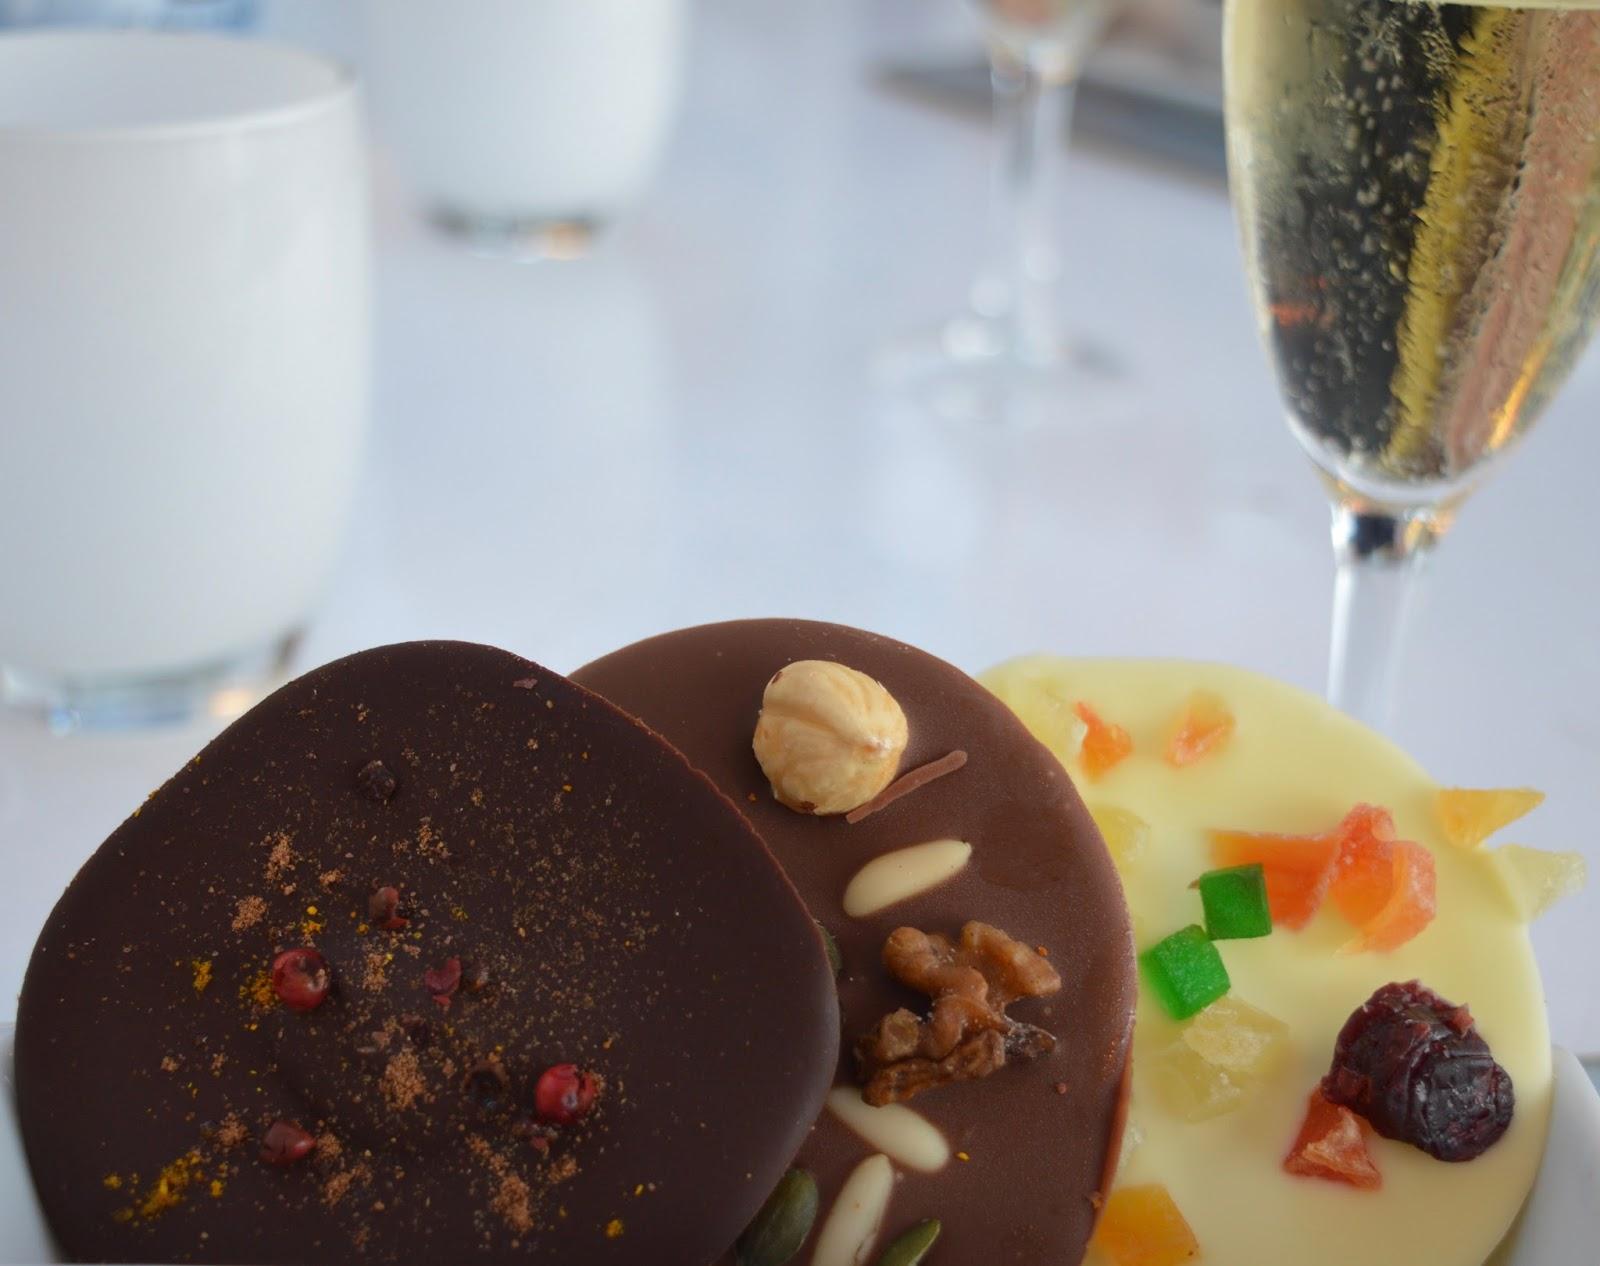 A walk from Calella de Palafrugell to Llafranc - Hotel LLevant tasting menu